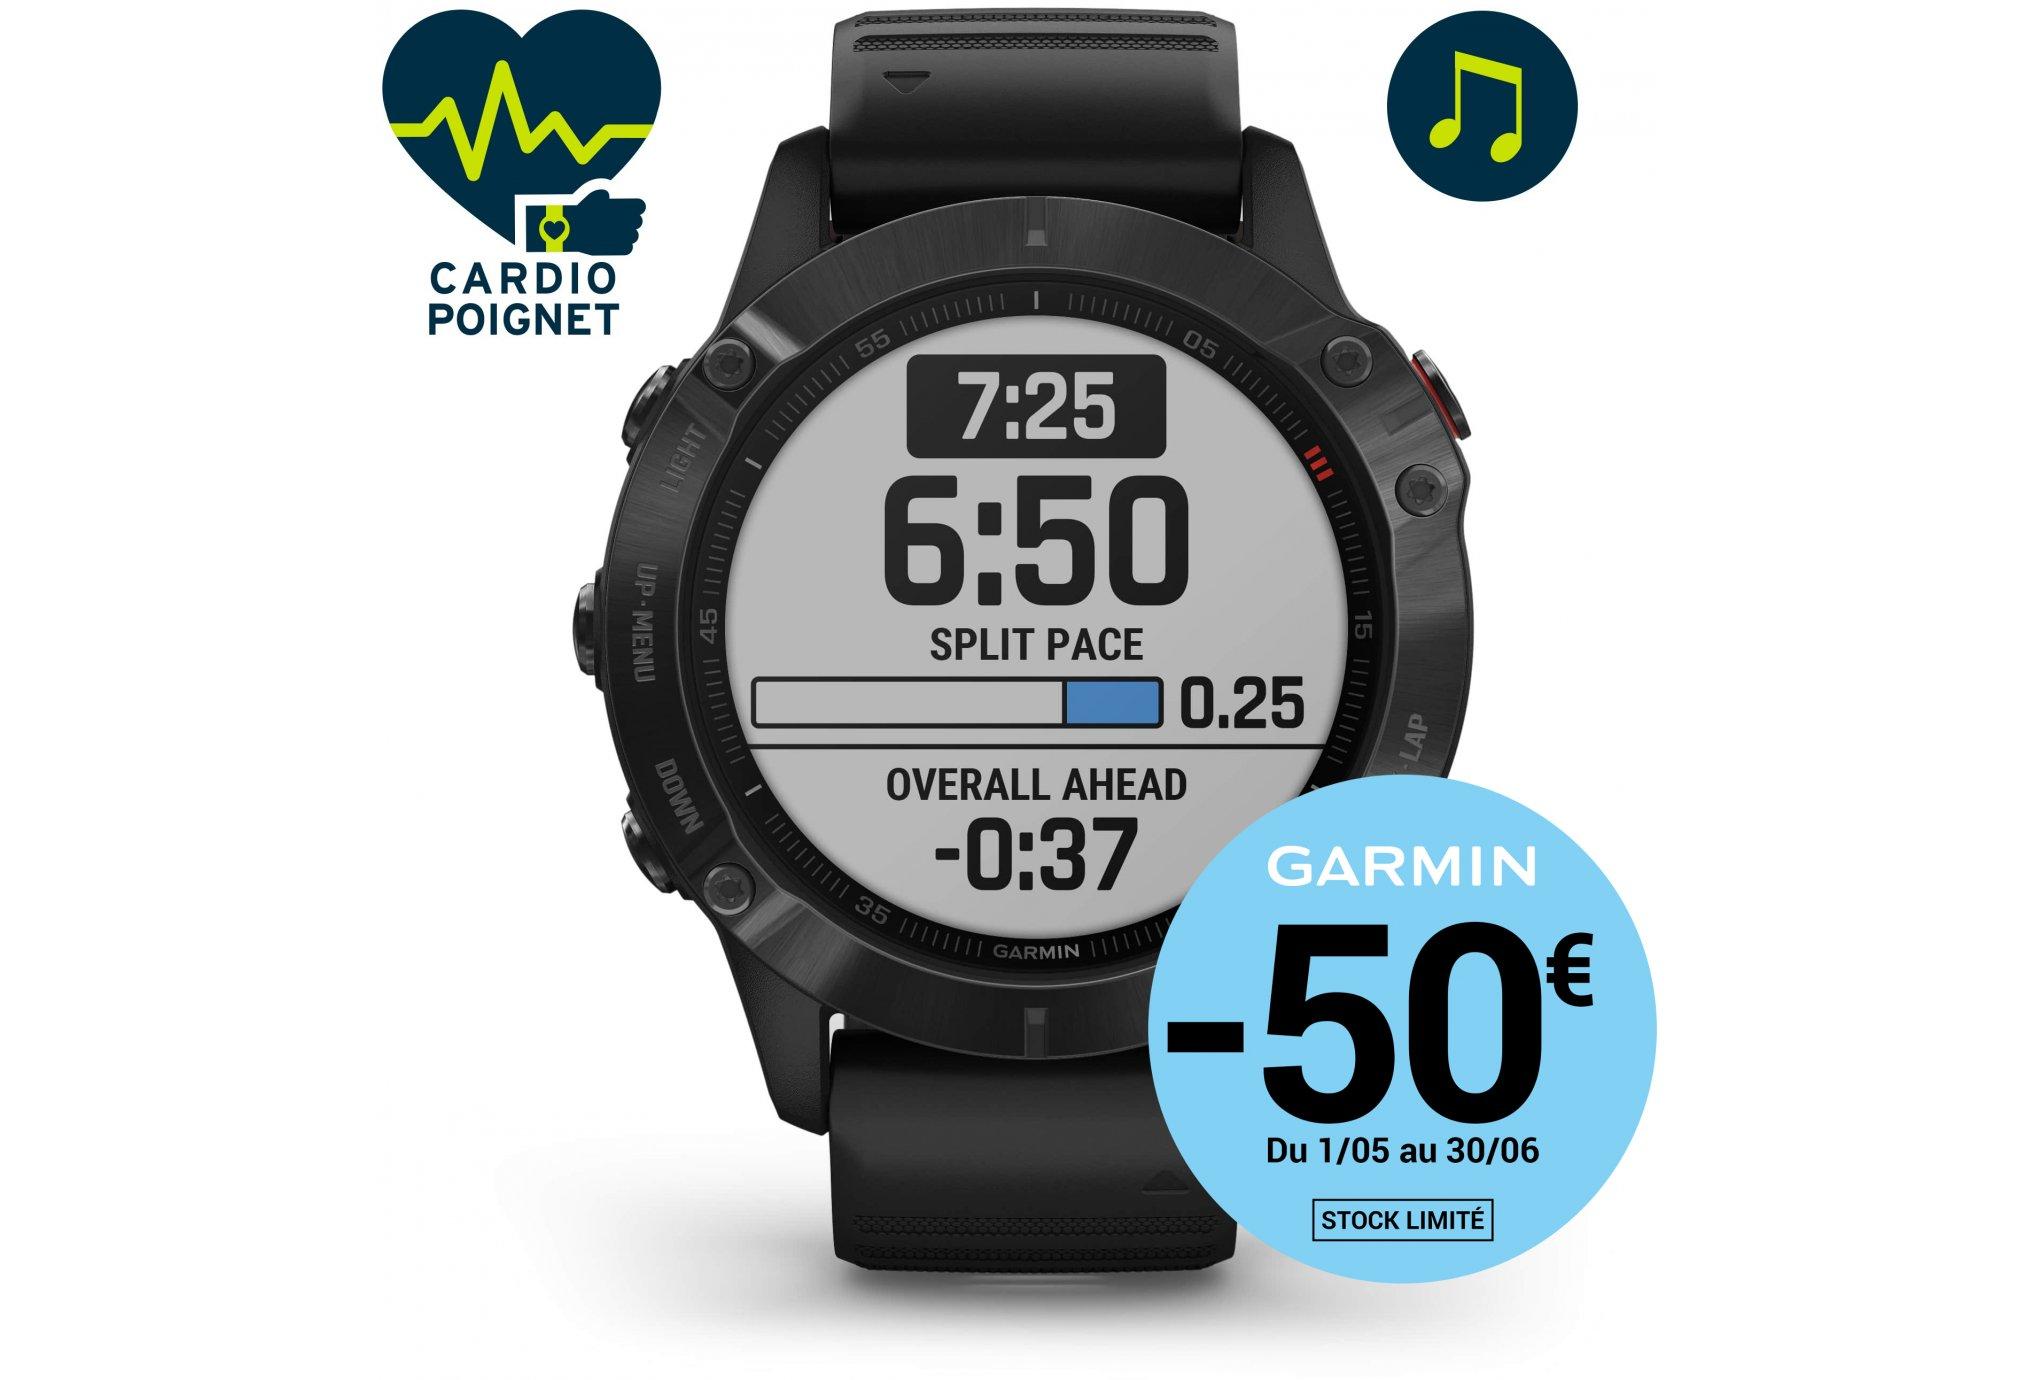 Garmin Fenix 6 Pro Cardio-Gps